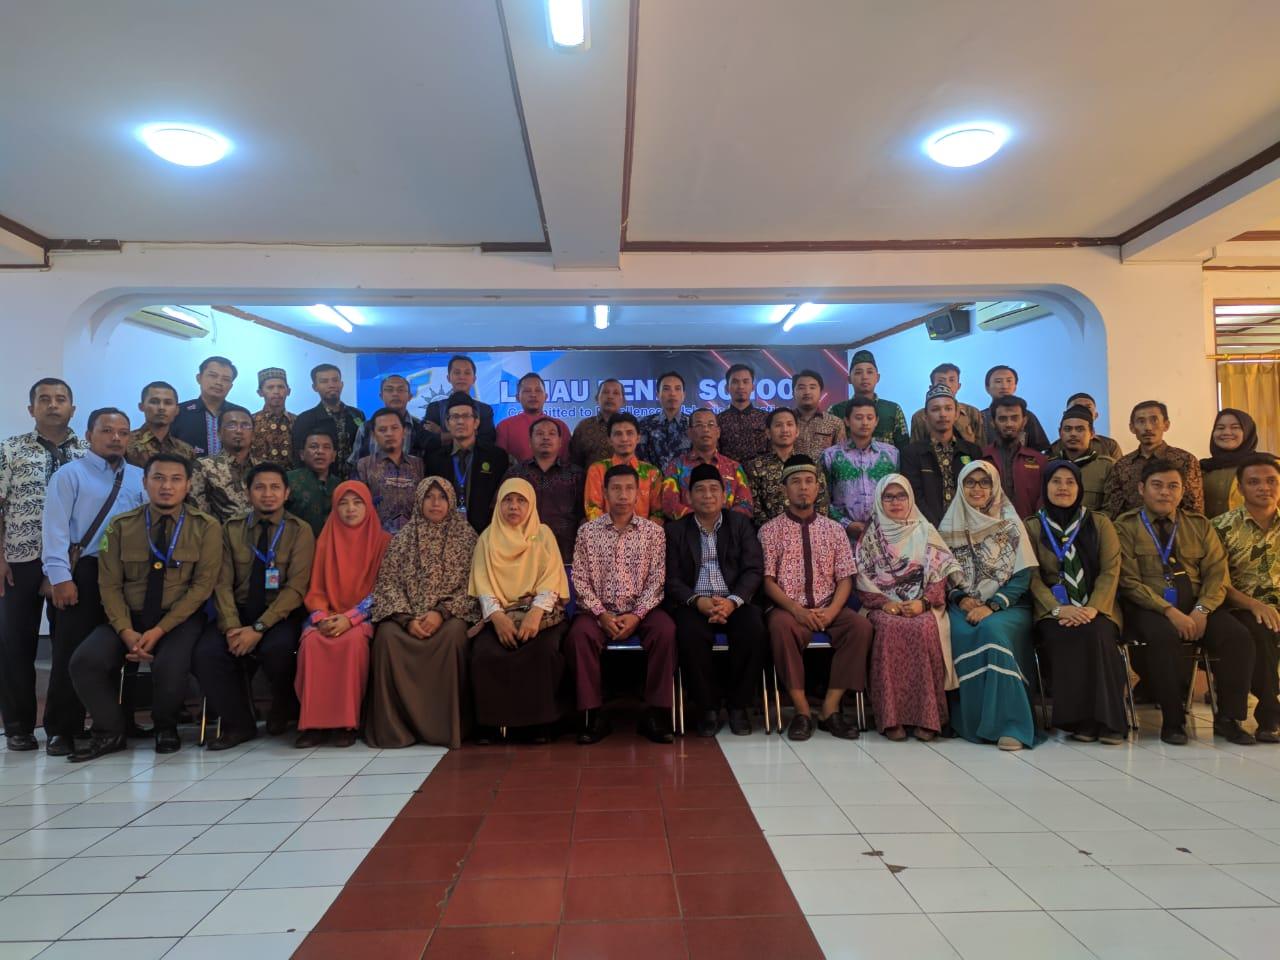 Waka Humas SMK Mutu ikuti Program K3SM Kunjungi Sekolah Unggulan di 3 Kota